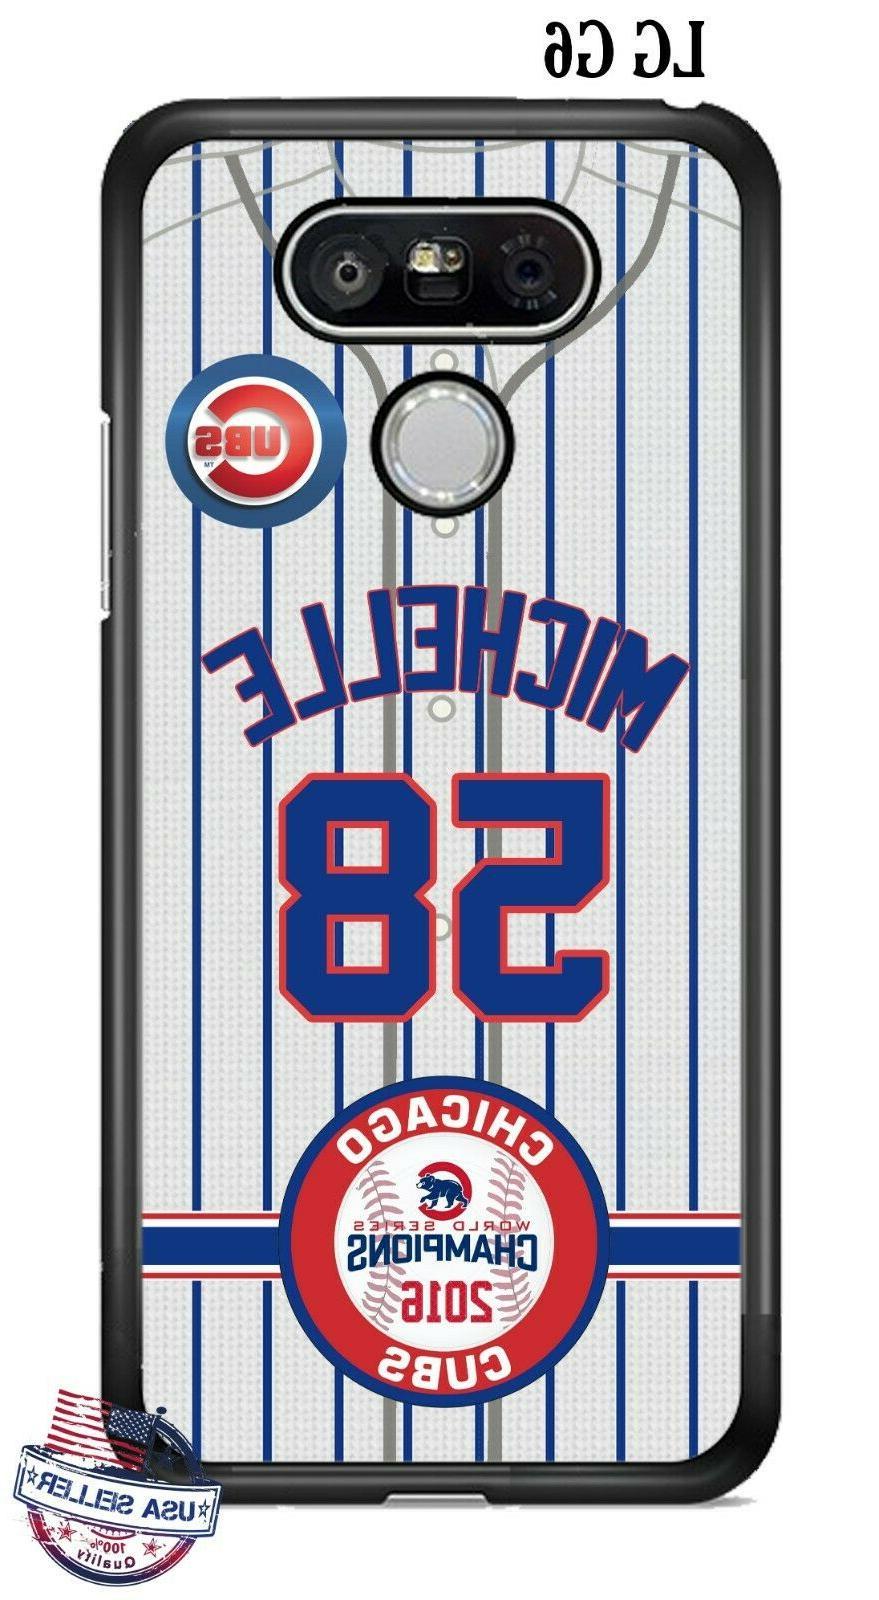 CHICAGO BASEBALL iPHONE